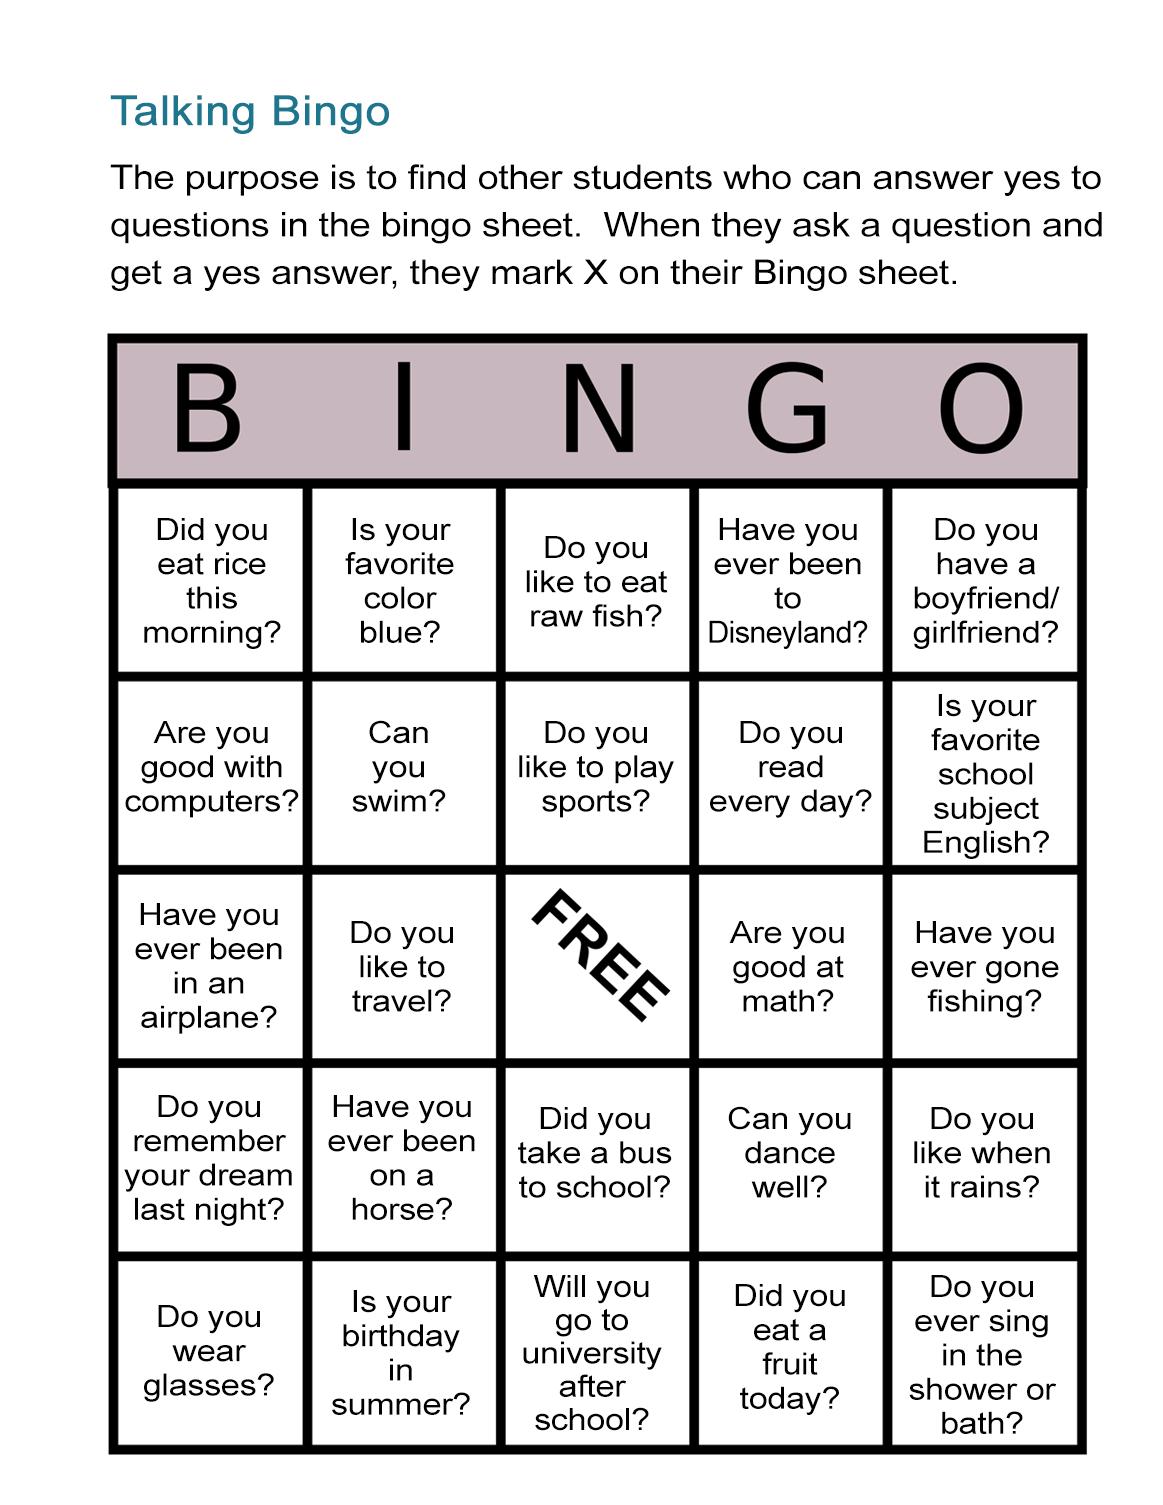 Esl Bingo Free Worksheet: Stand-Up Bingo - All Esl - Free Printable Esl Resources